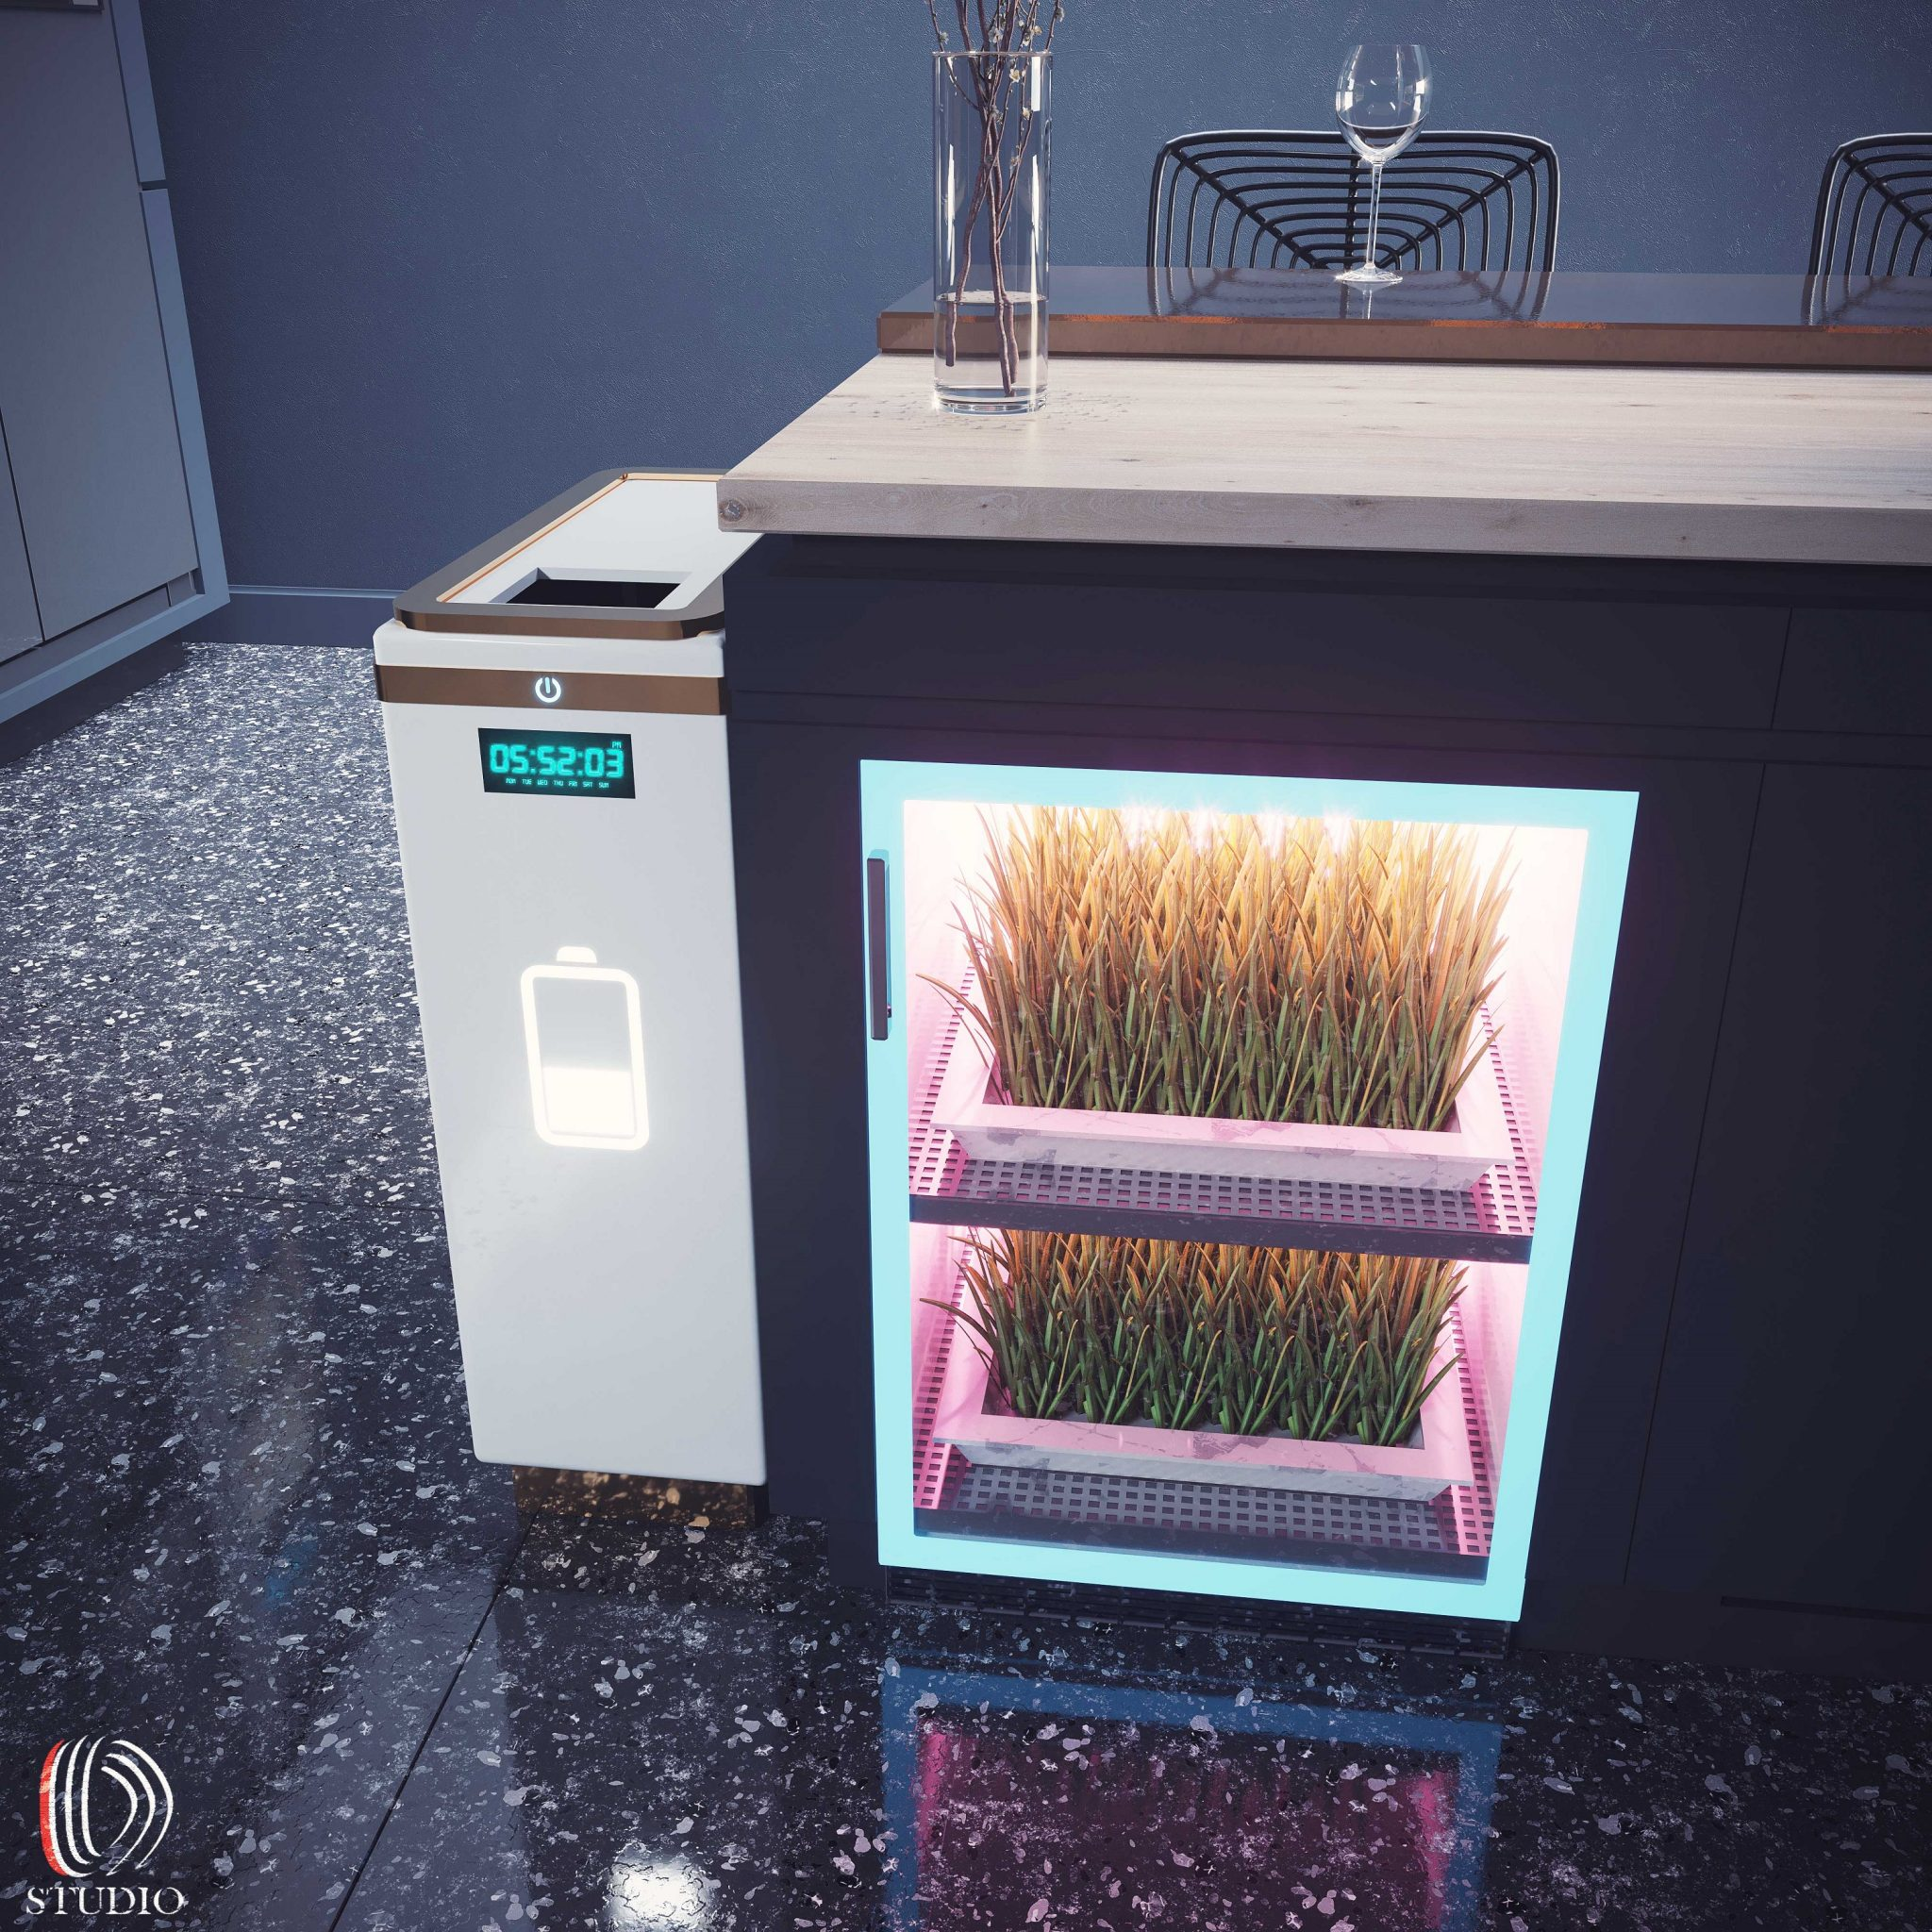 00-20-01-Smart-Kitchen-Technology-View5